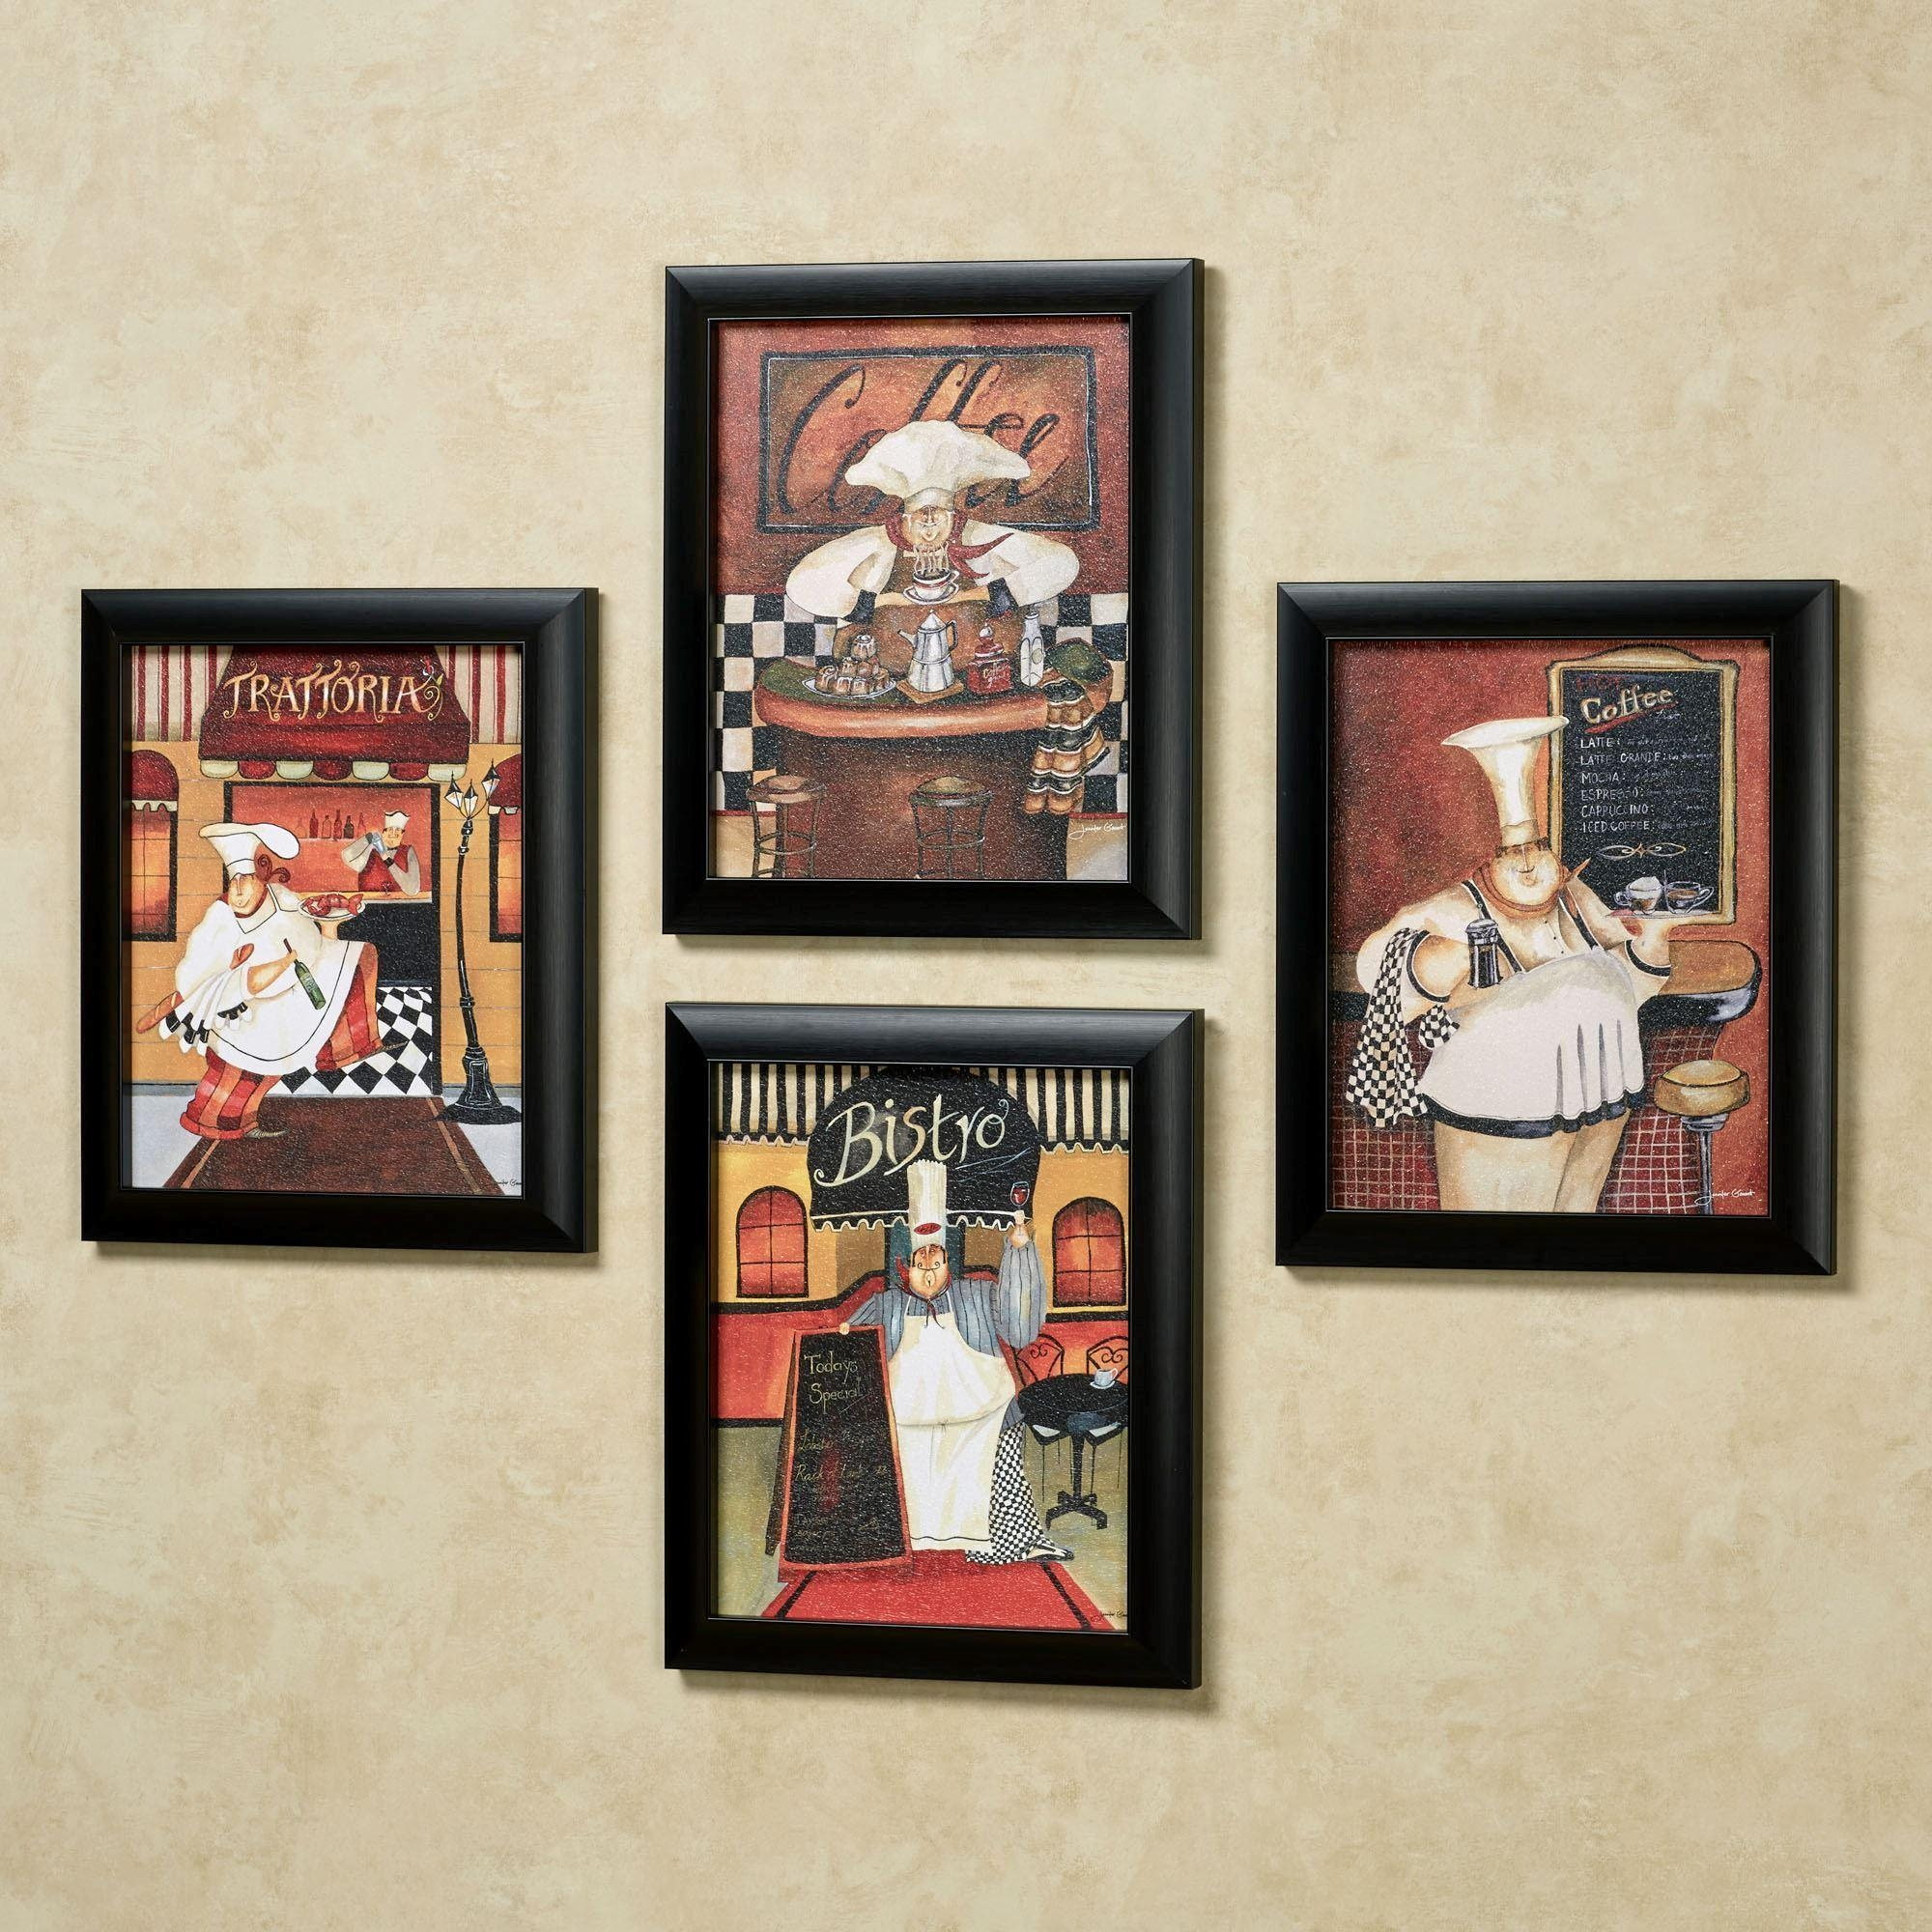 Framed Art Prints   Touch Of Class Inside Italian Overlook Framed Wall Art Sets (Image 8 of 20)